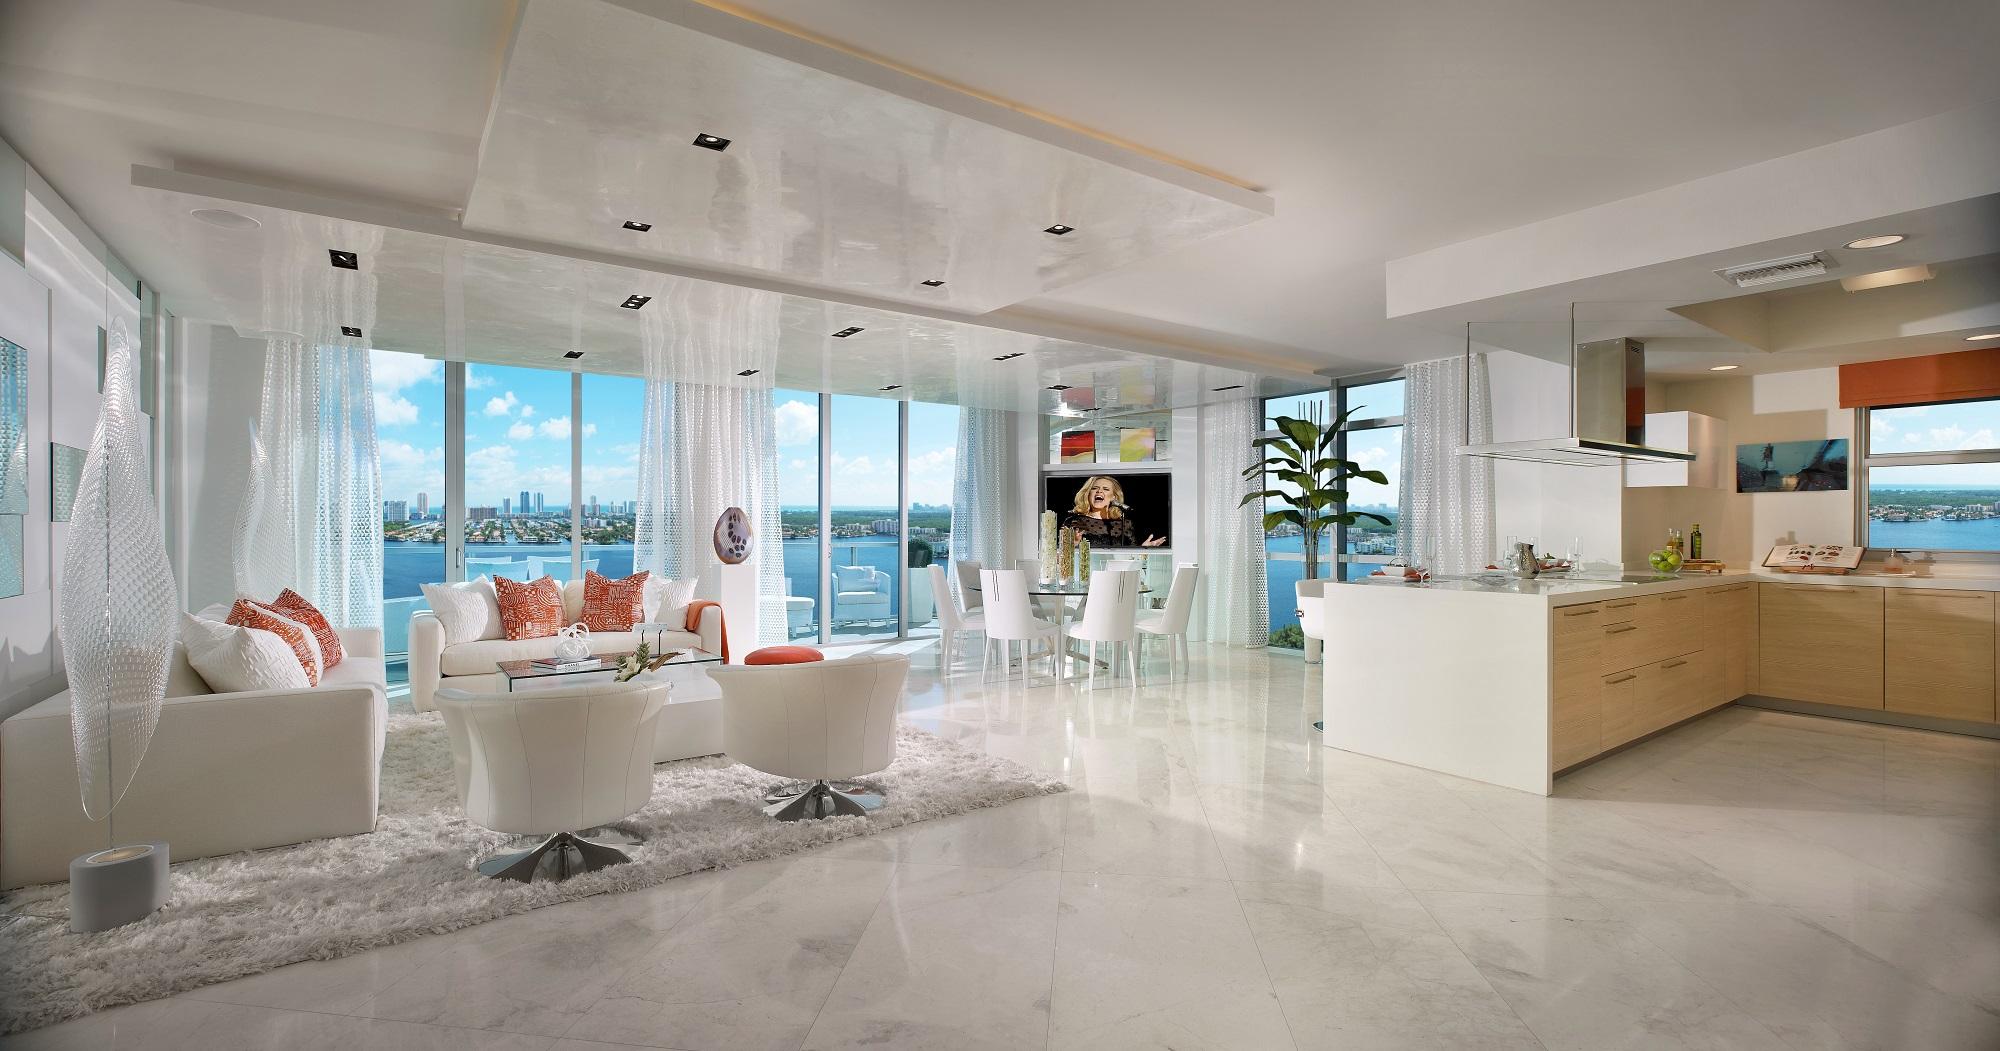 Rooms For Rent In Bradenton Fla